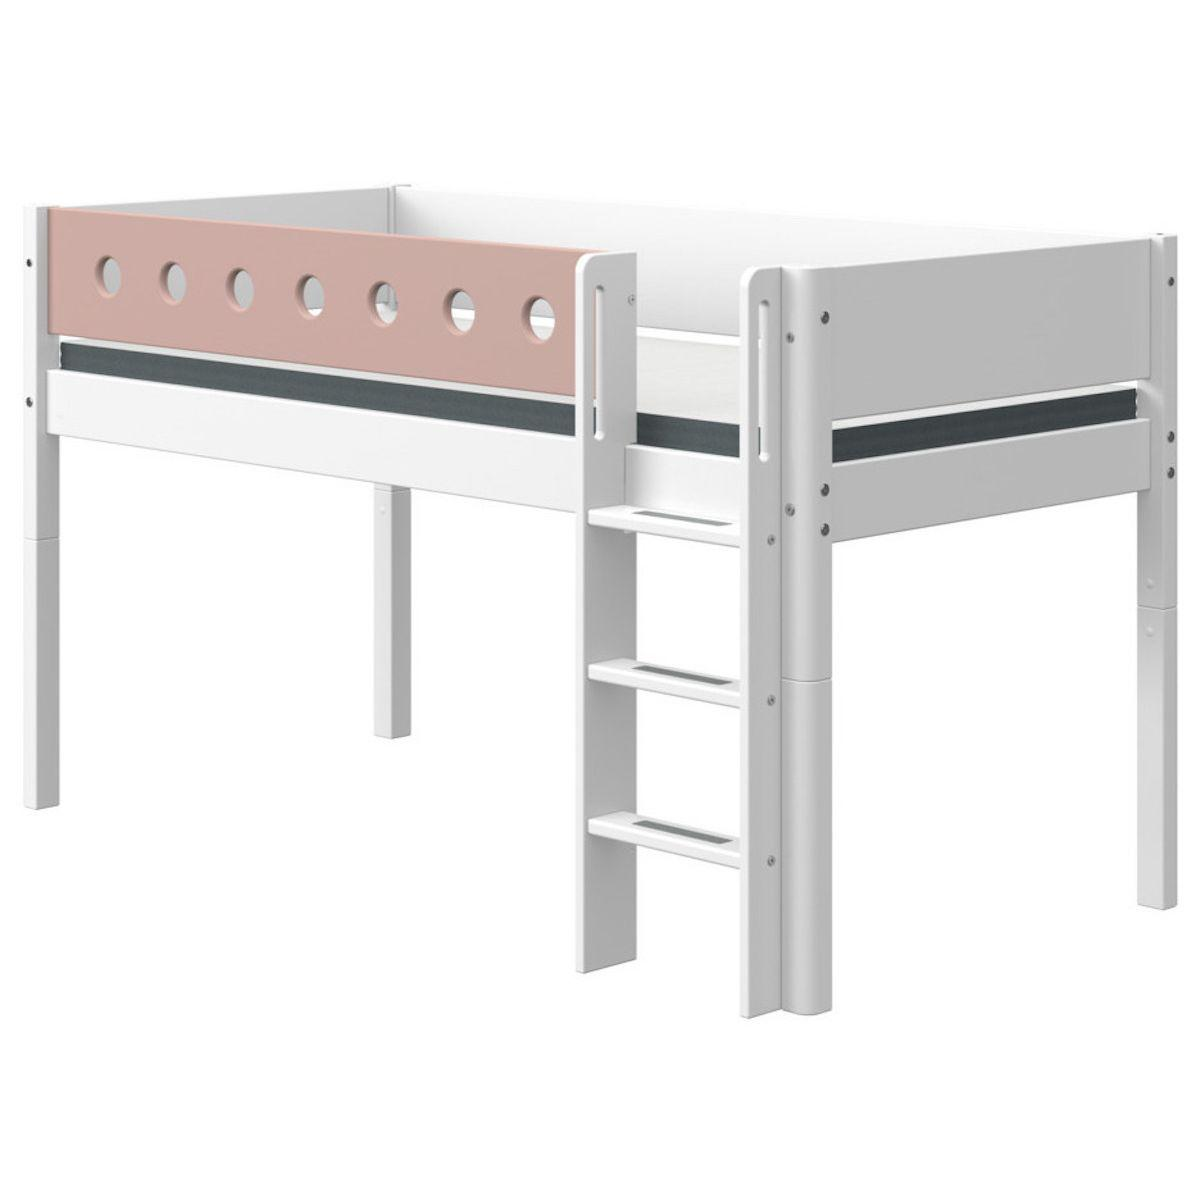 Cama media alta 90x200cm escalera recta WHITE Flexa blanco-rosa claro